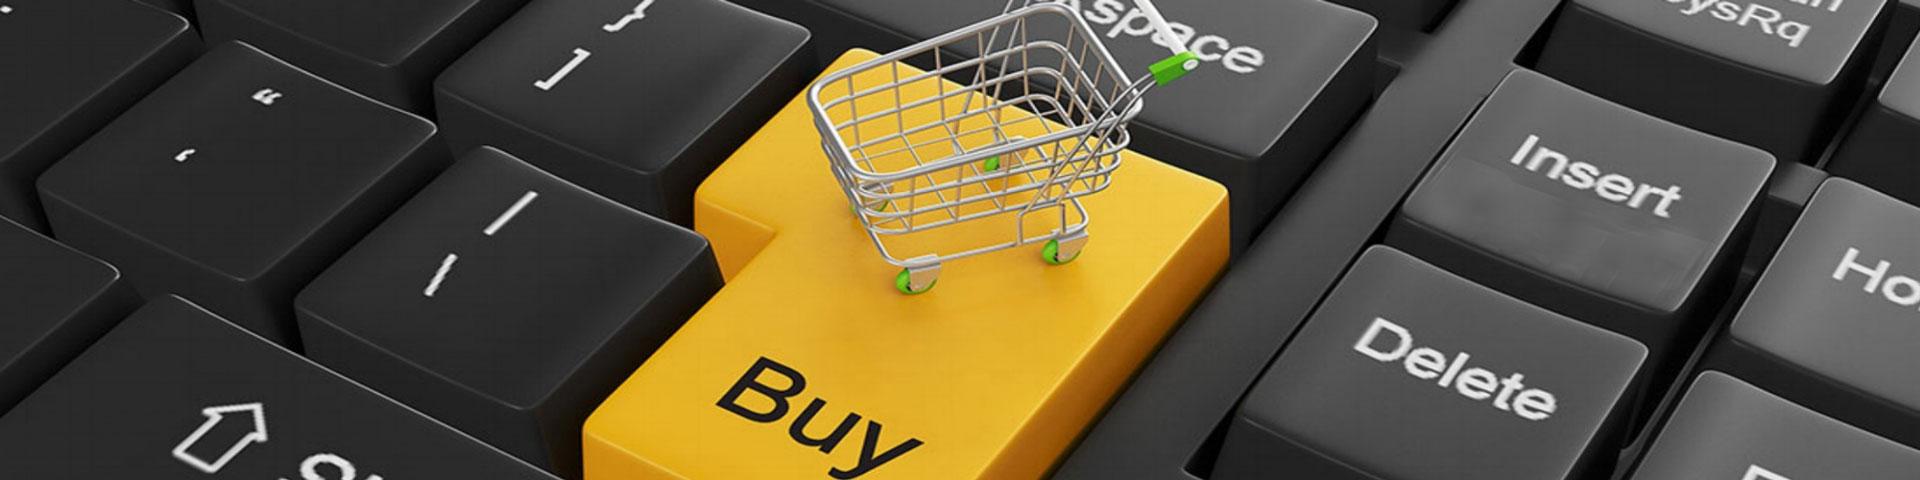 Ecommerce_sales-203833-edited.jpg